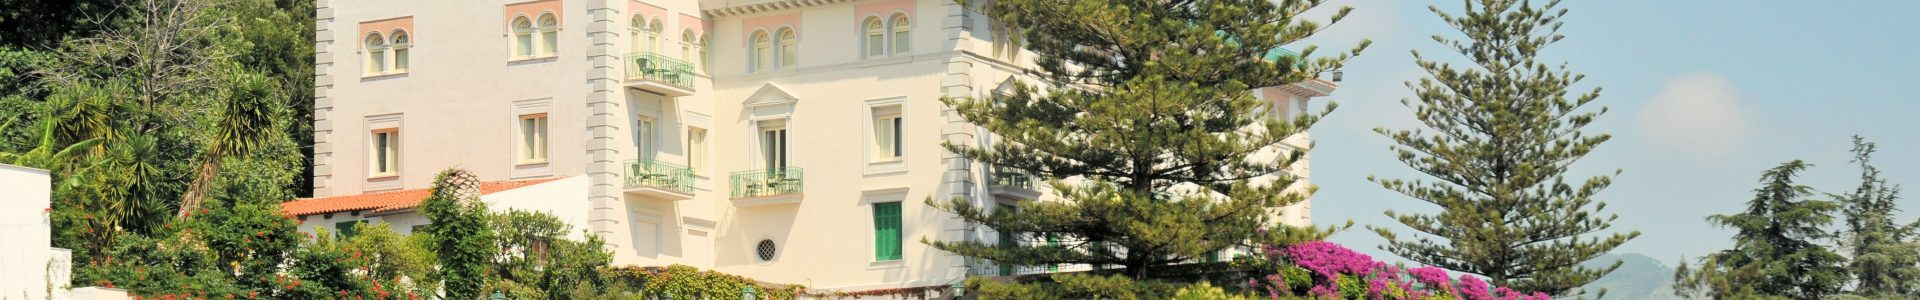 Calabria, Italy – Yoga Retreat 2022